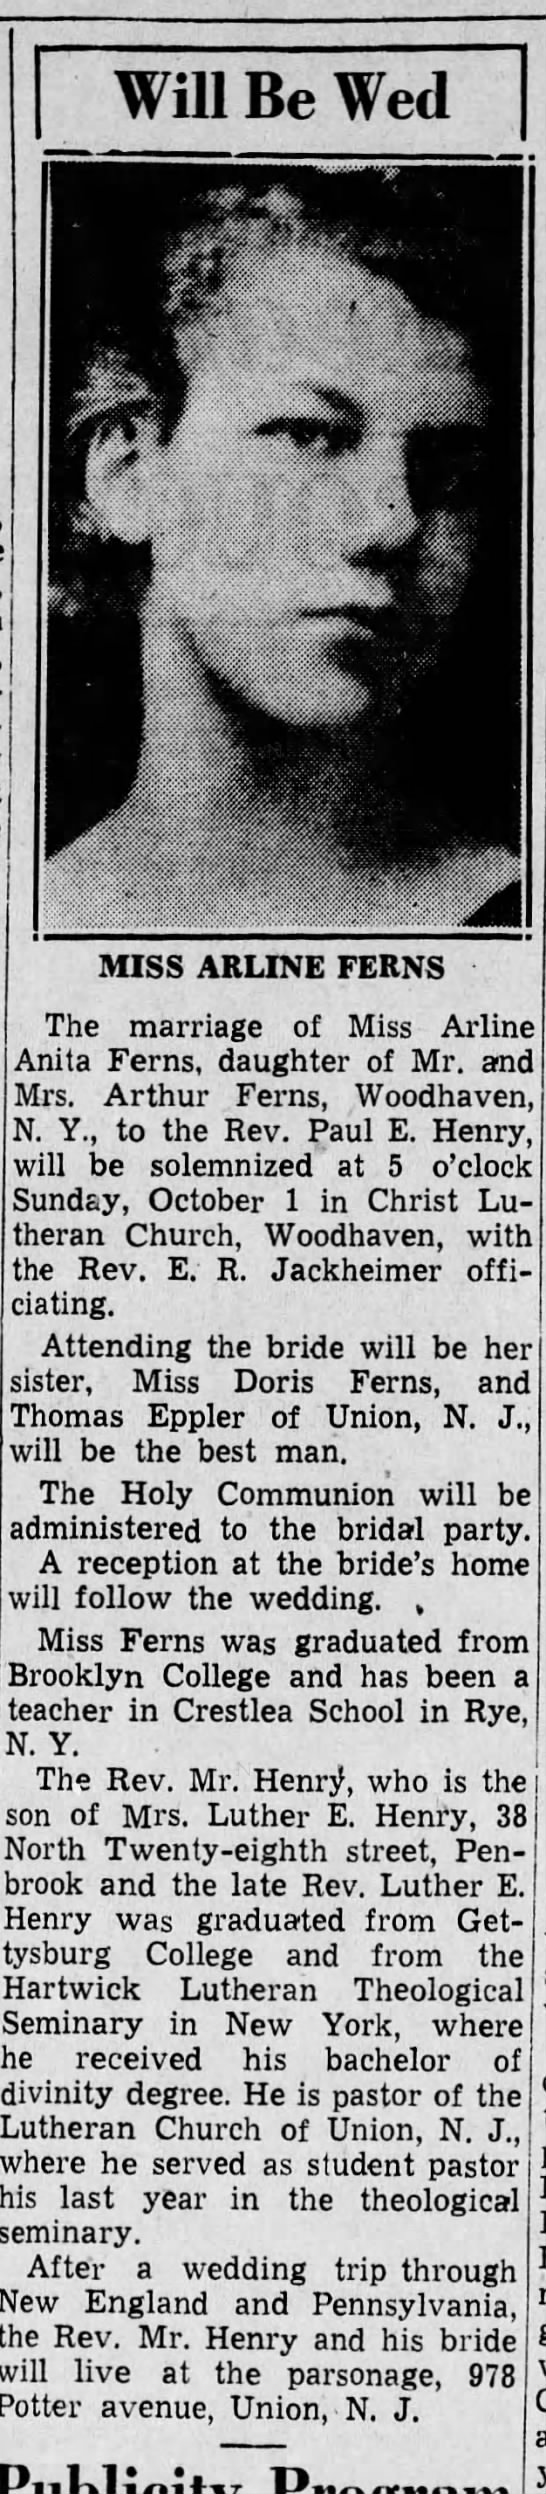 Harrisburg Telegraph 9-27-1939 - Will Be Wed . - V h I 'Ik MISS ARLINE FERNS The...